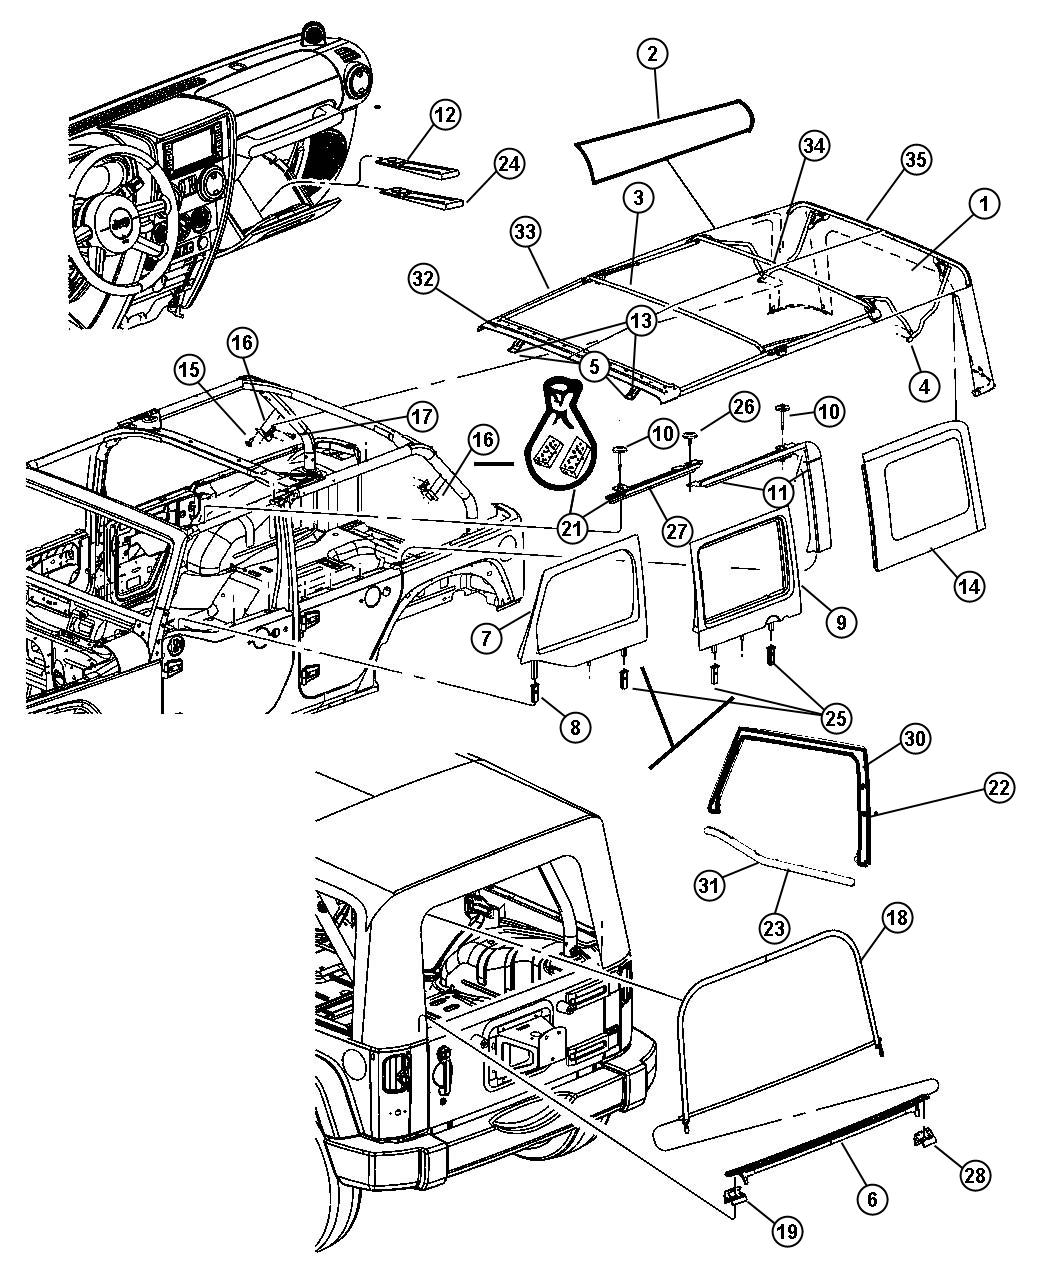 2007 jeep wrangler parts diagram fender s1 switch wiring soft top oem imageresizertool com